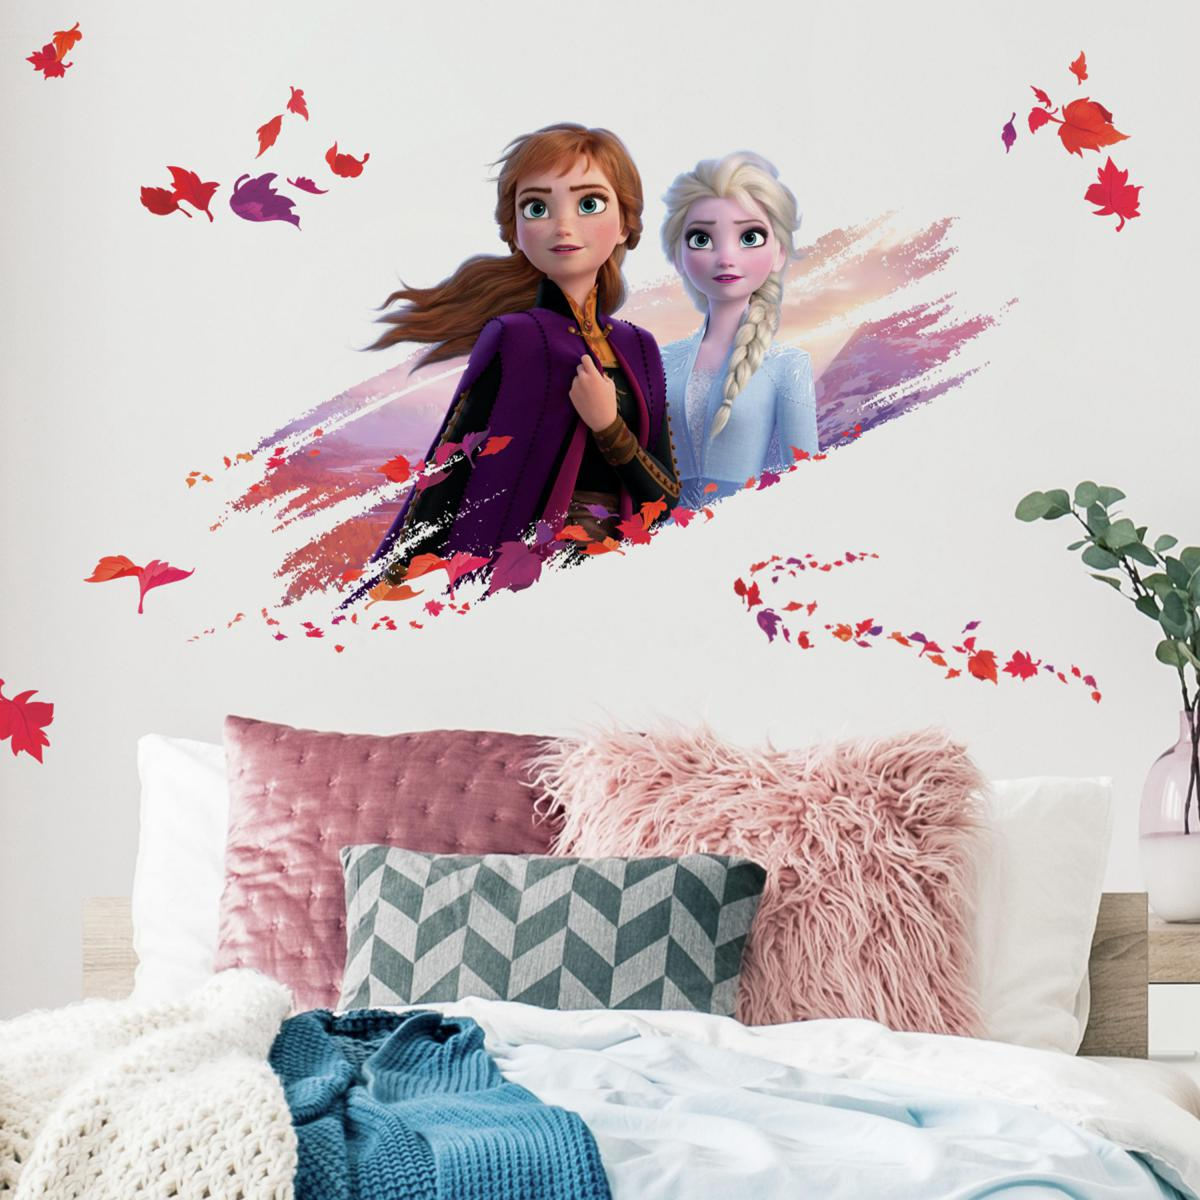 Roommates Stickers Elsa & Anna La Reine des Neiges 2 Disney